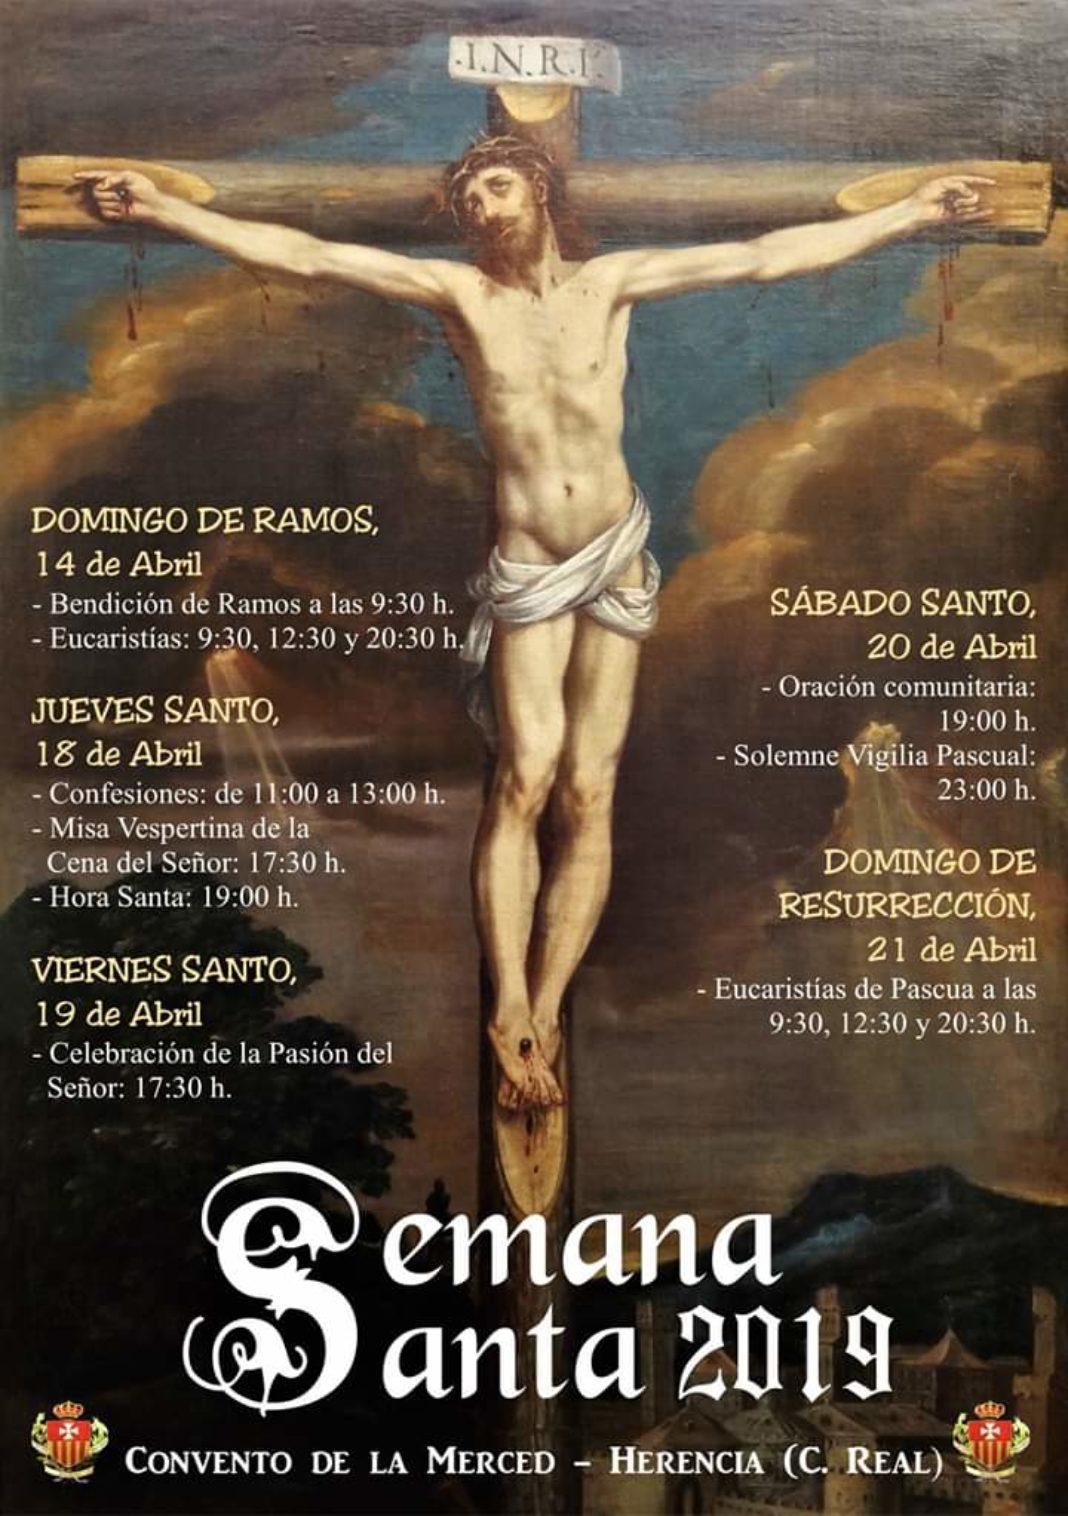 Celebraciones de Semana Santa en la iglesia conventual de La Merced 2